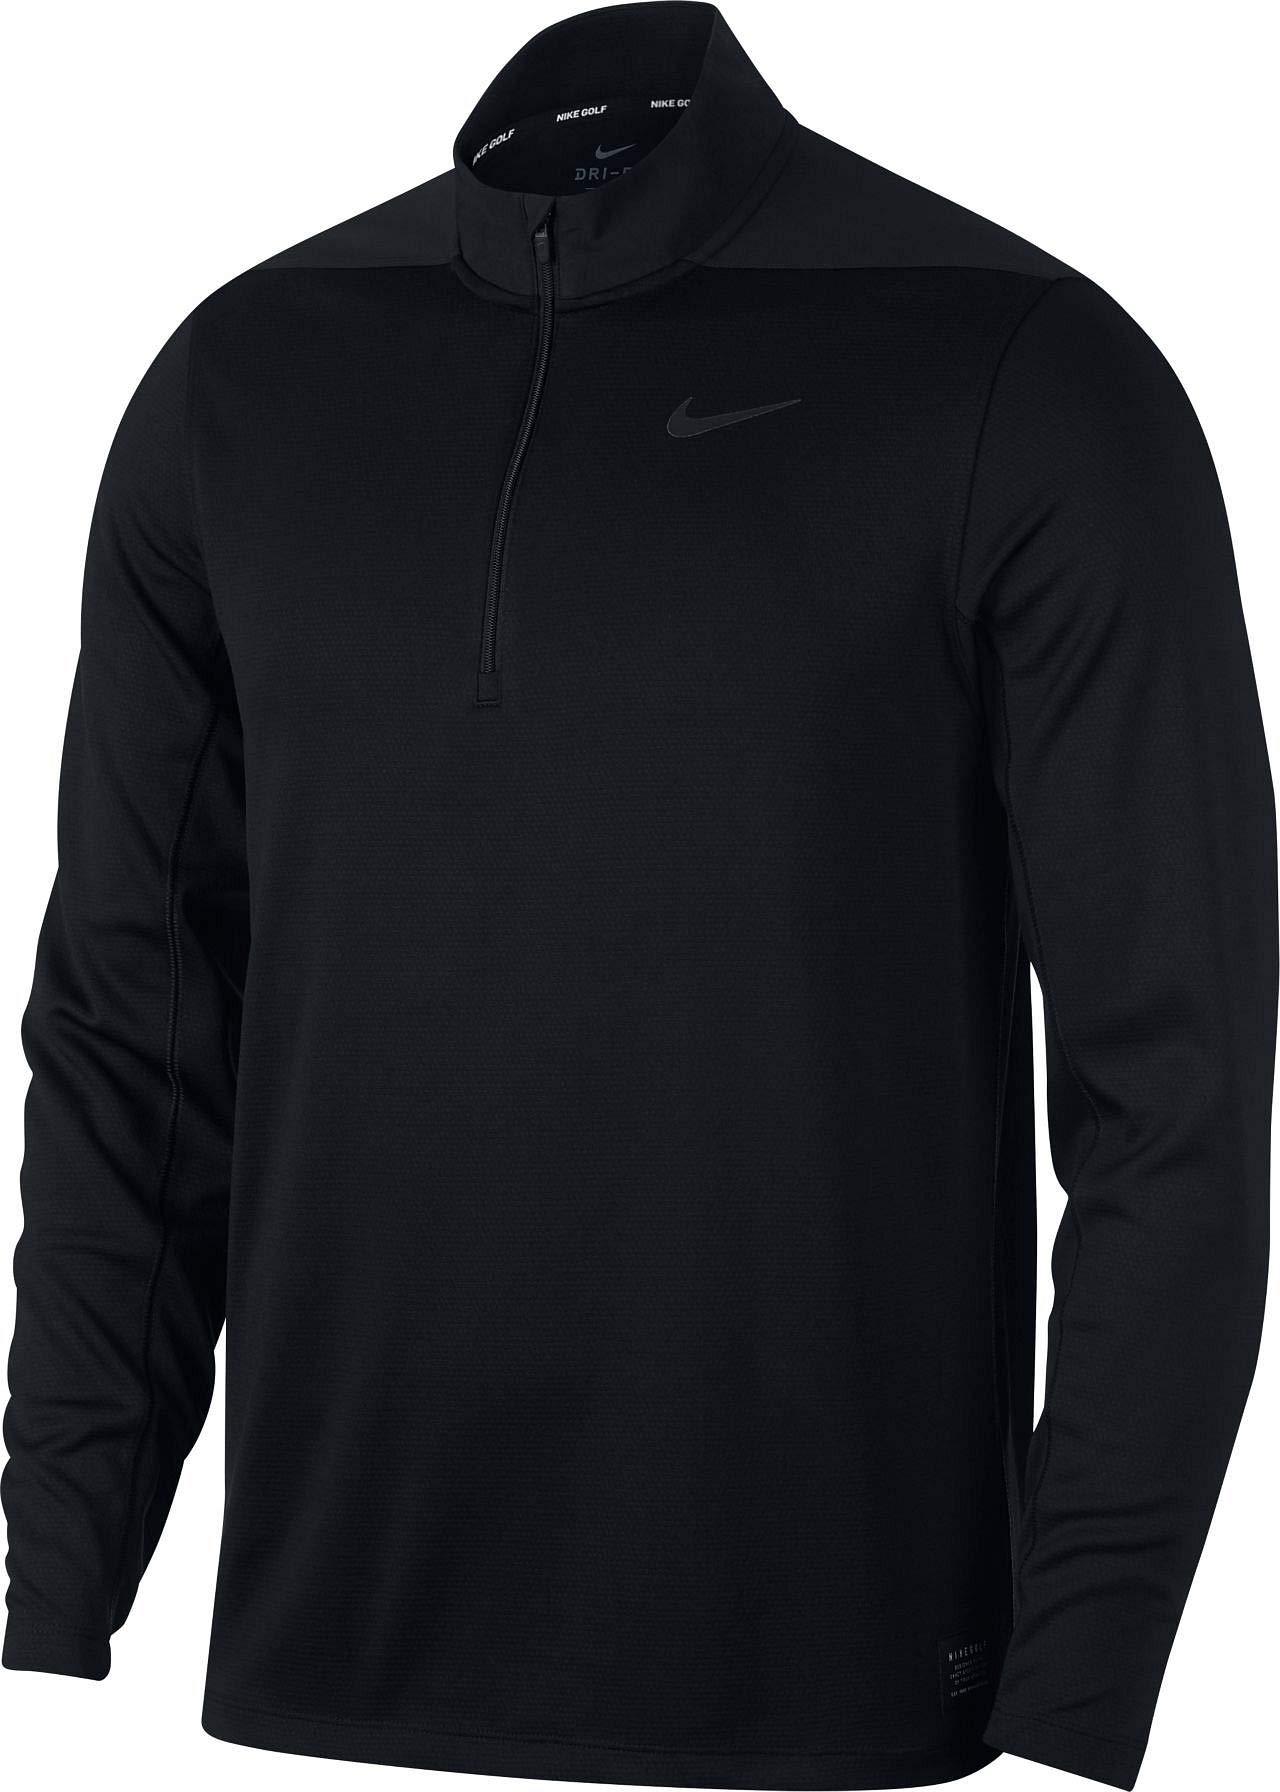 Nike Men's Dry Top Half Zip core, Black/Black/Black/Black, Small